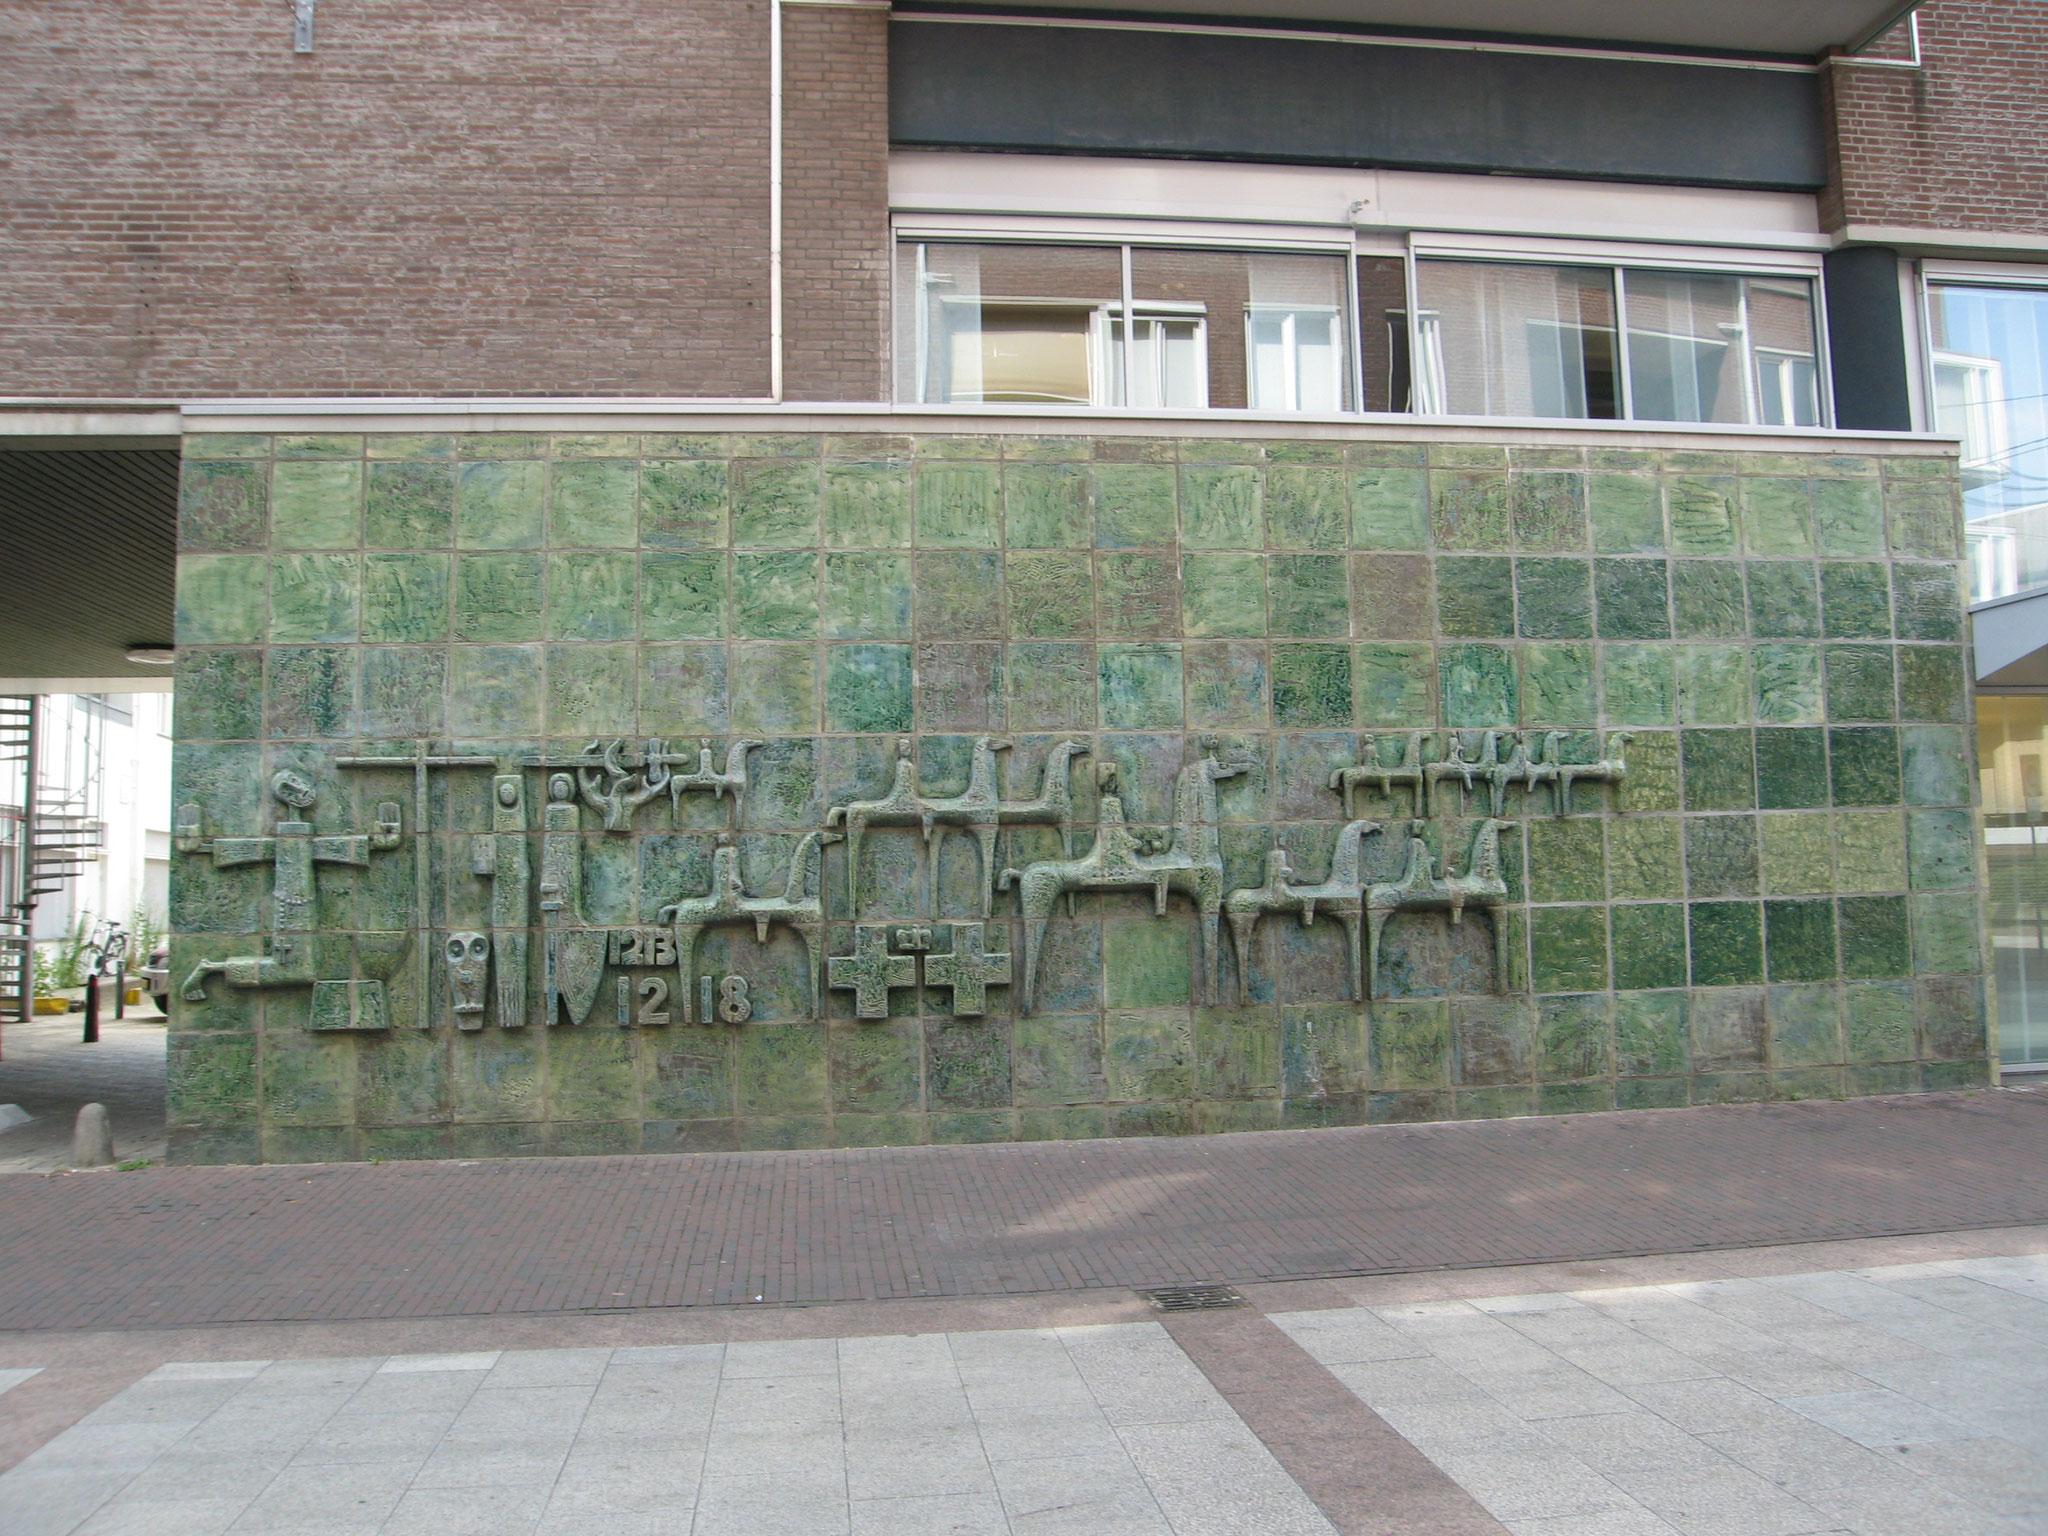 Naoorlogse gevelkunst aan de Kloosterwandstraat